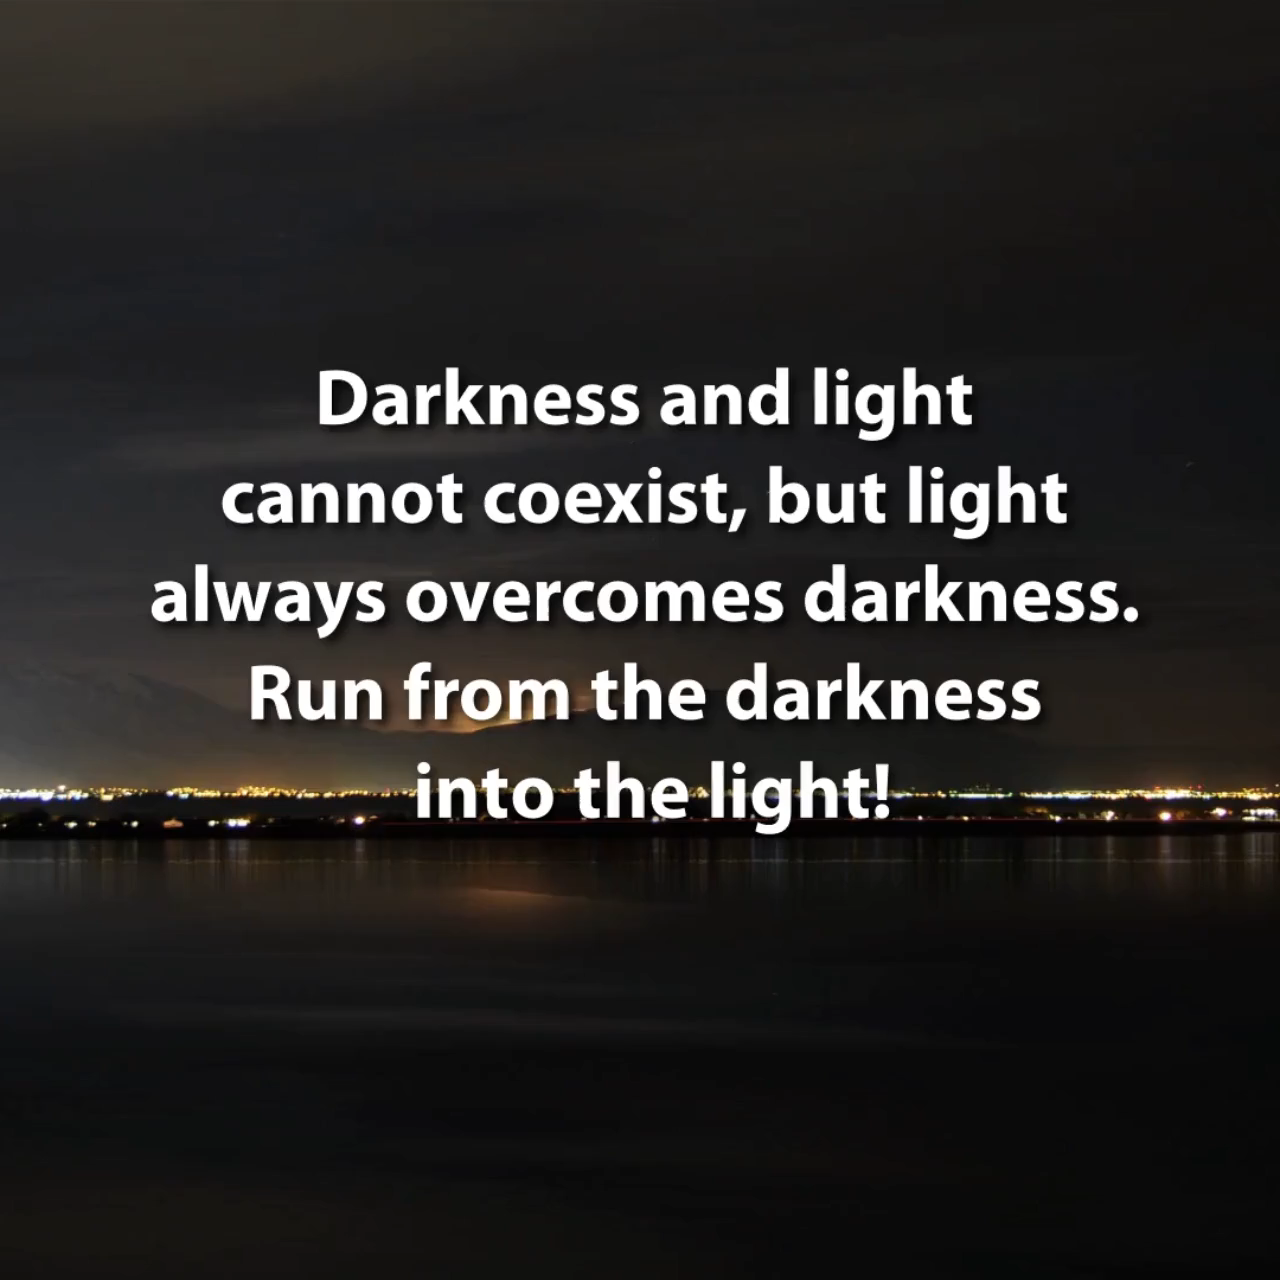 Run into the Light!